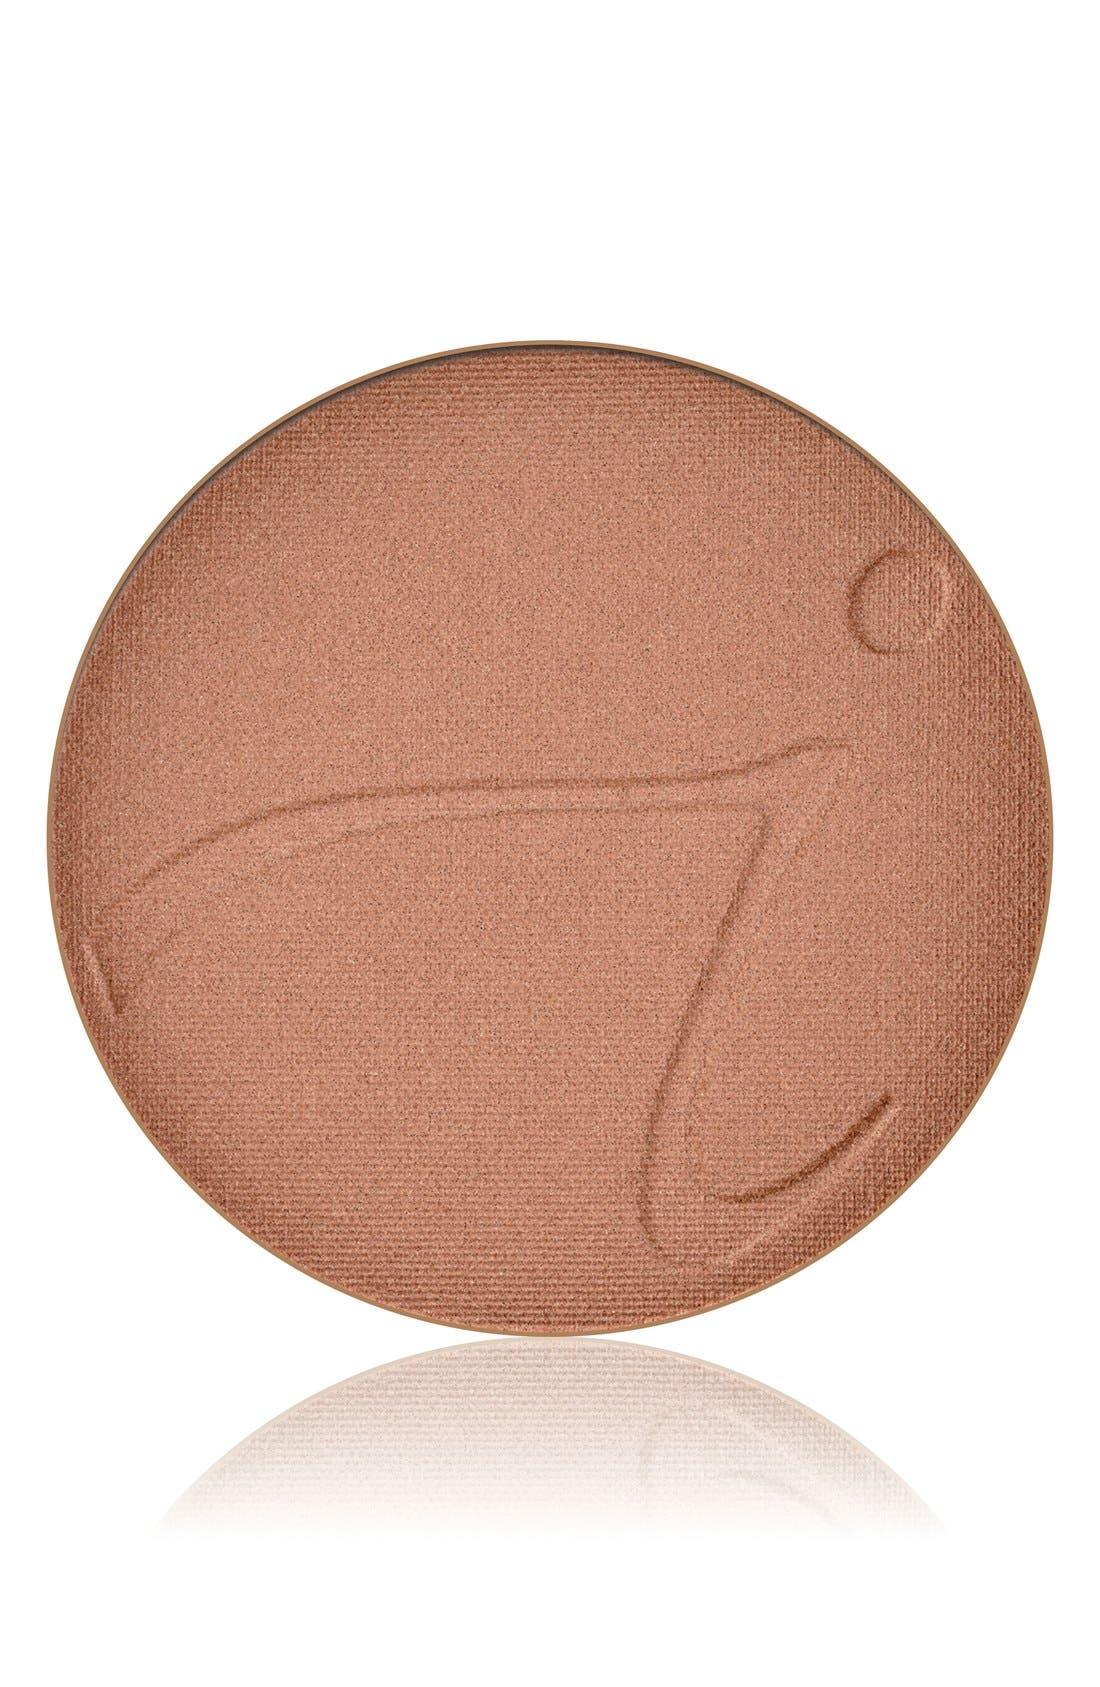 jane iredale So-Bronze® 1 Bronzing Powder Refill